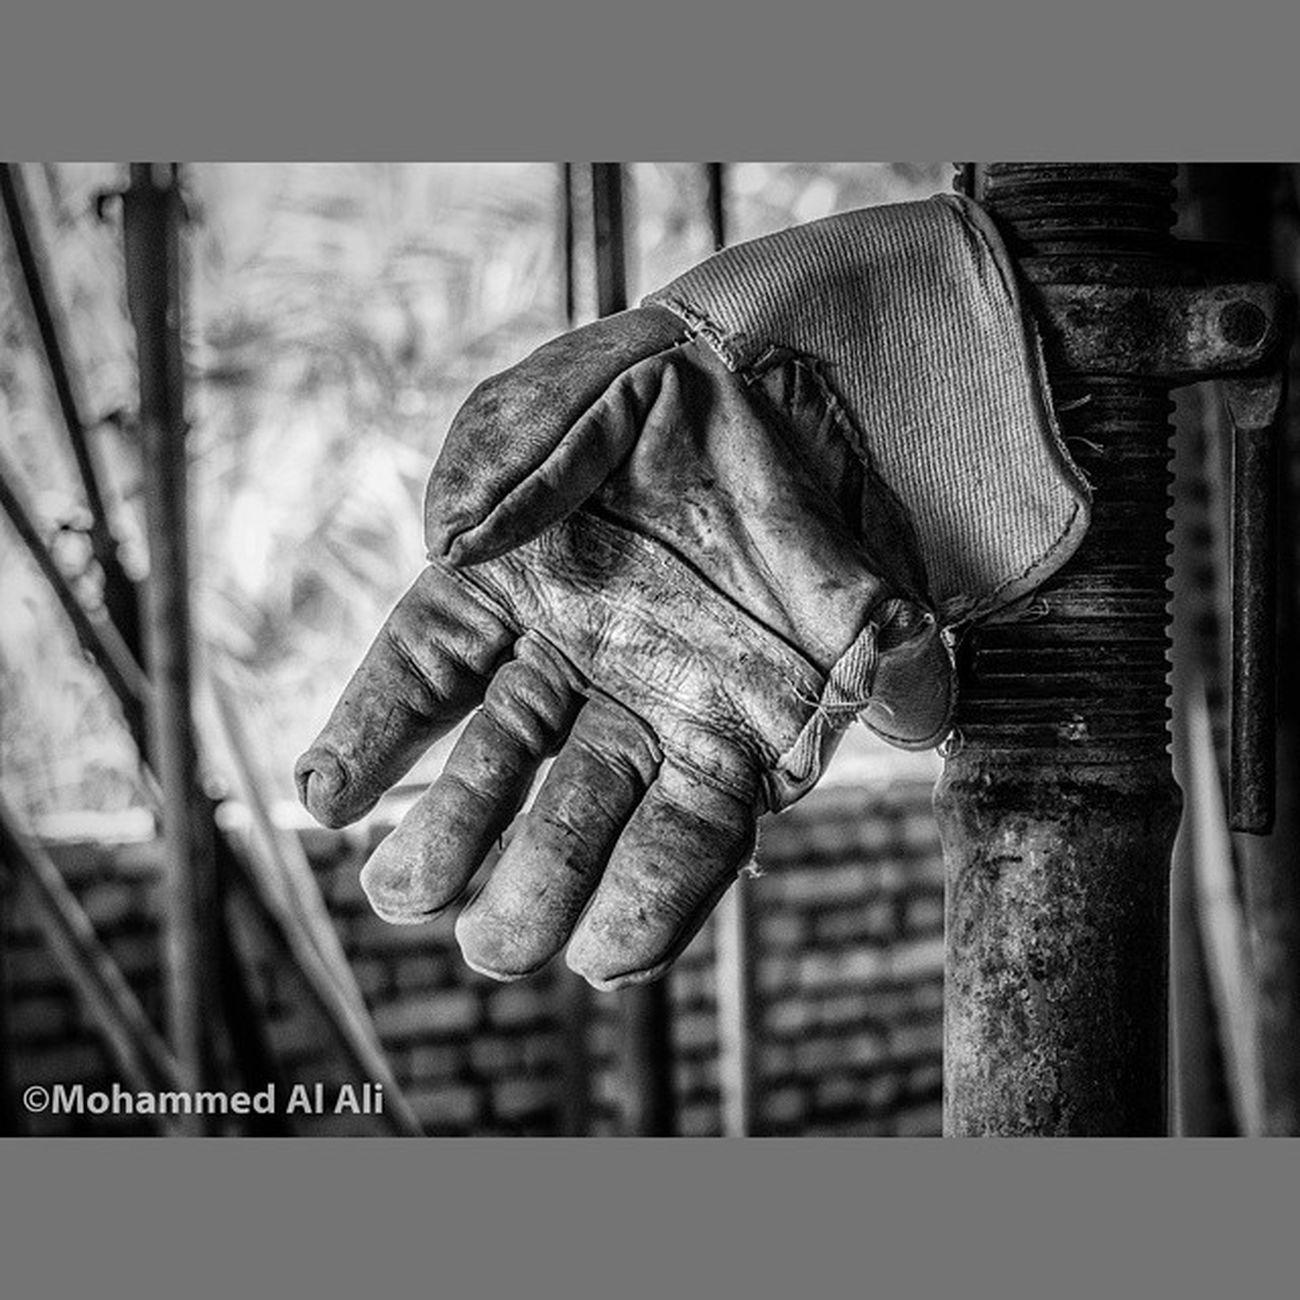 Olympus OlympusPEN PL7 Glove Micro_four_third Mft Bird Basrah Iraq Blackandwhite Monochrome